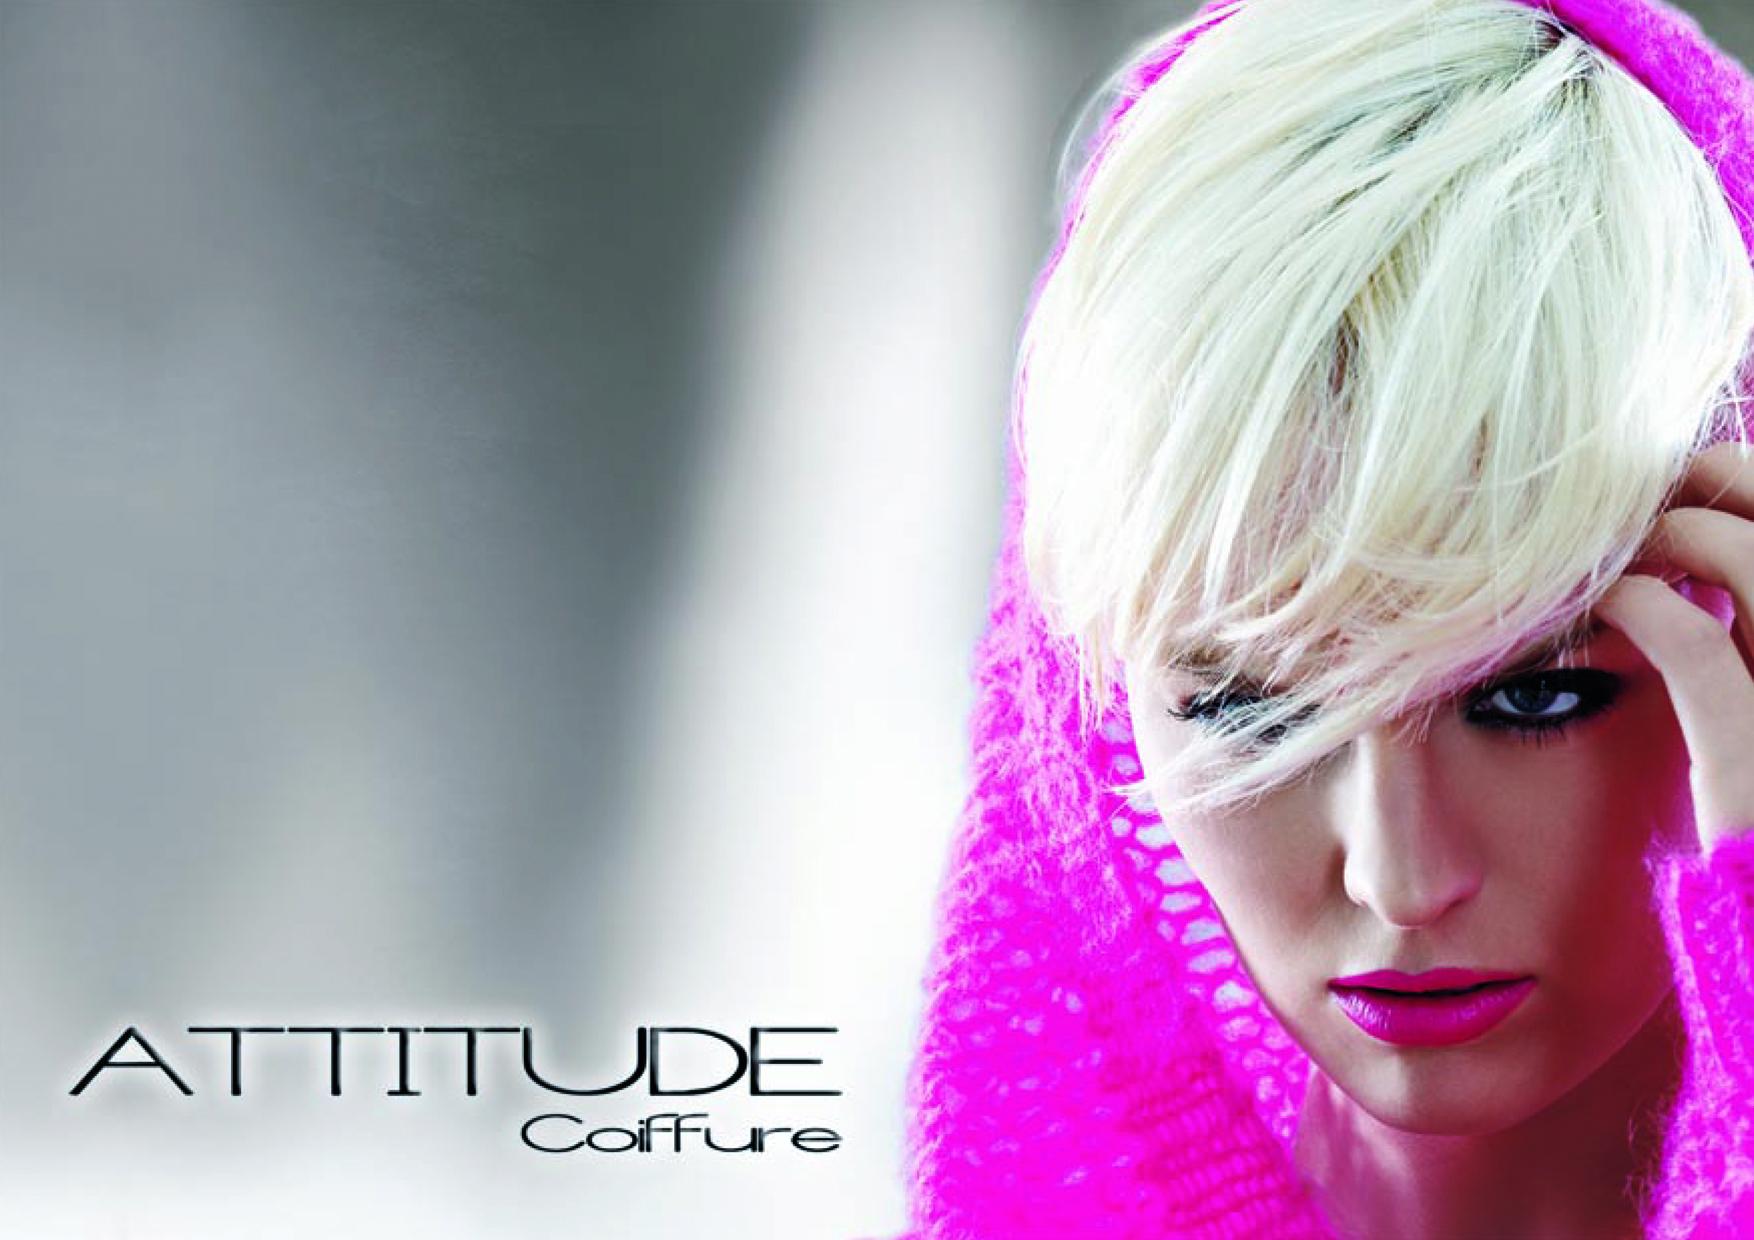 Attitude Coiffure